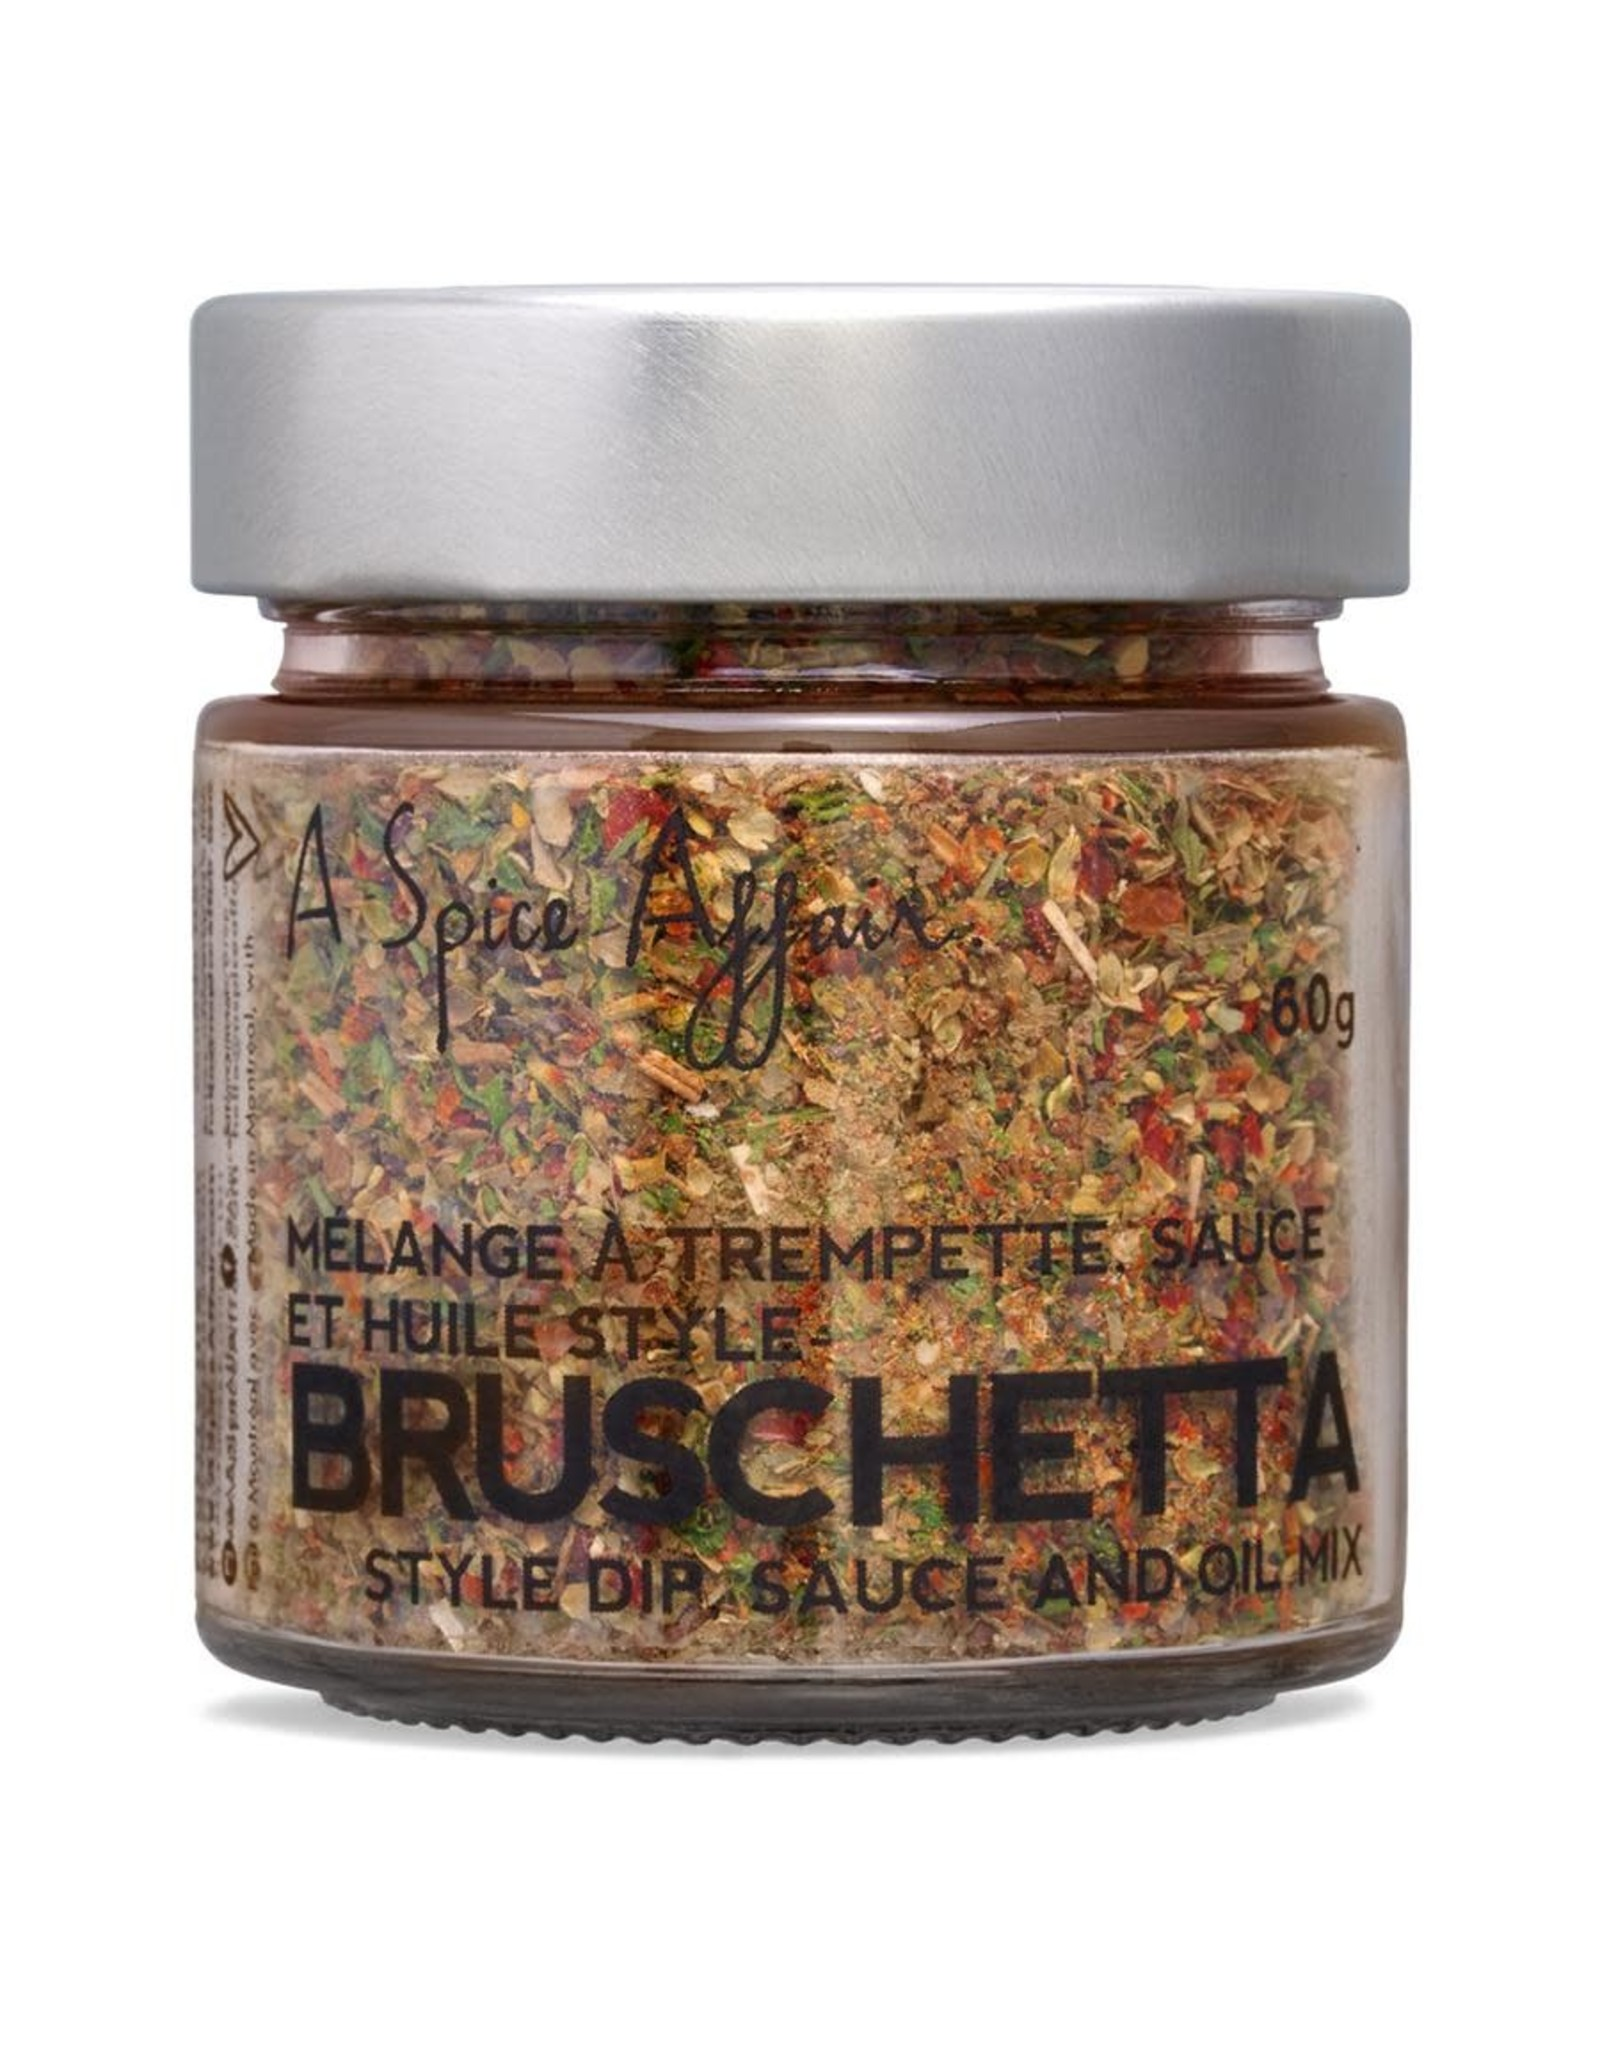 A Spice Affair Bruschetta Dip Mix